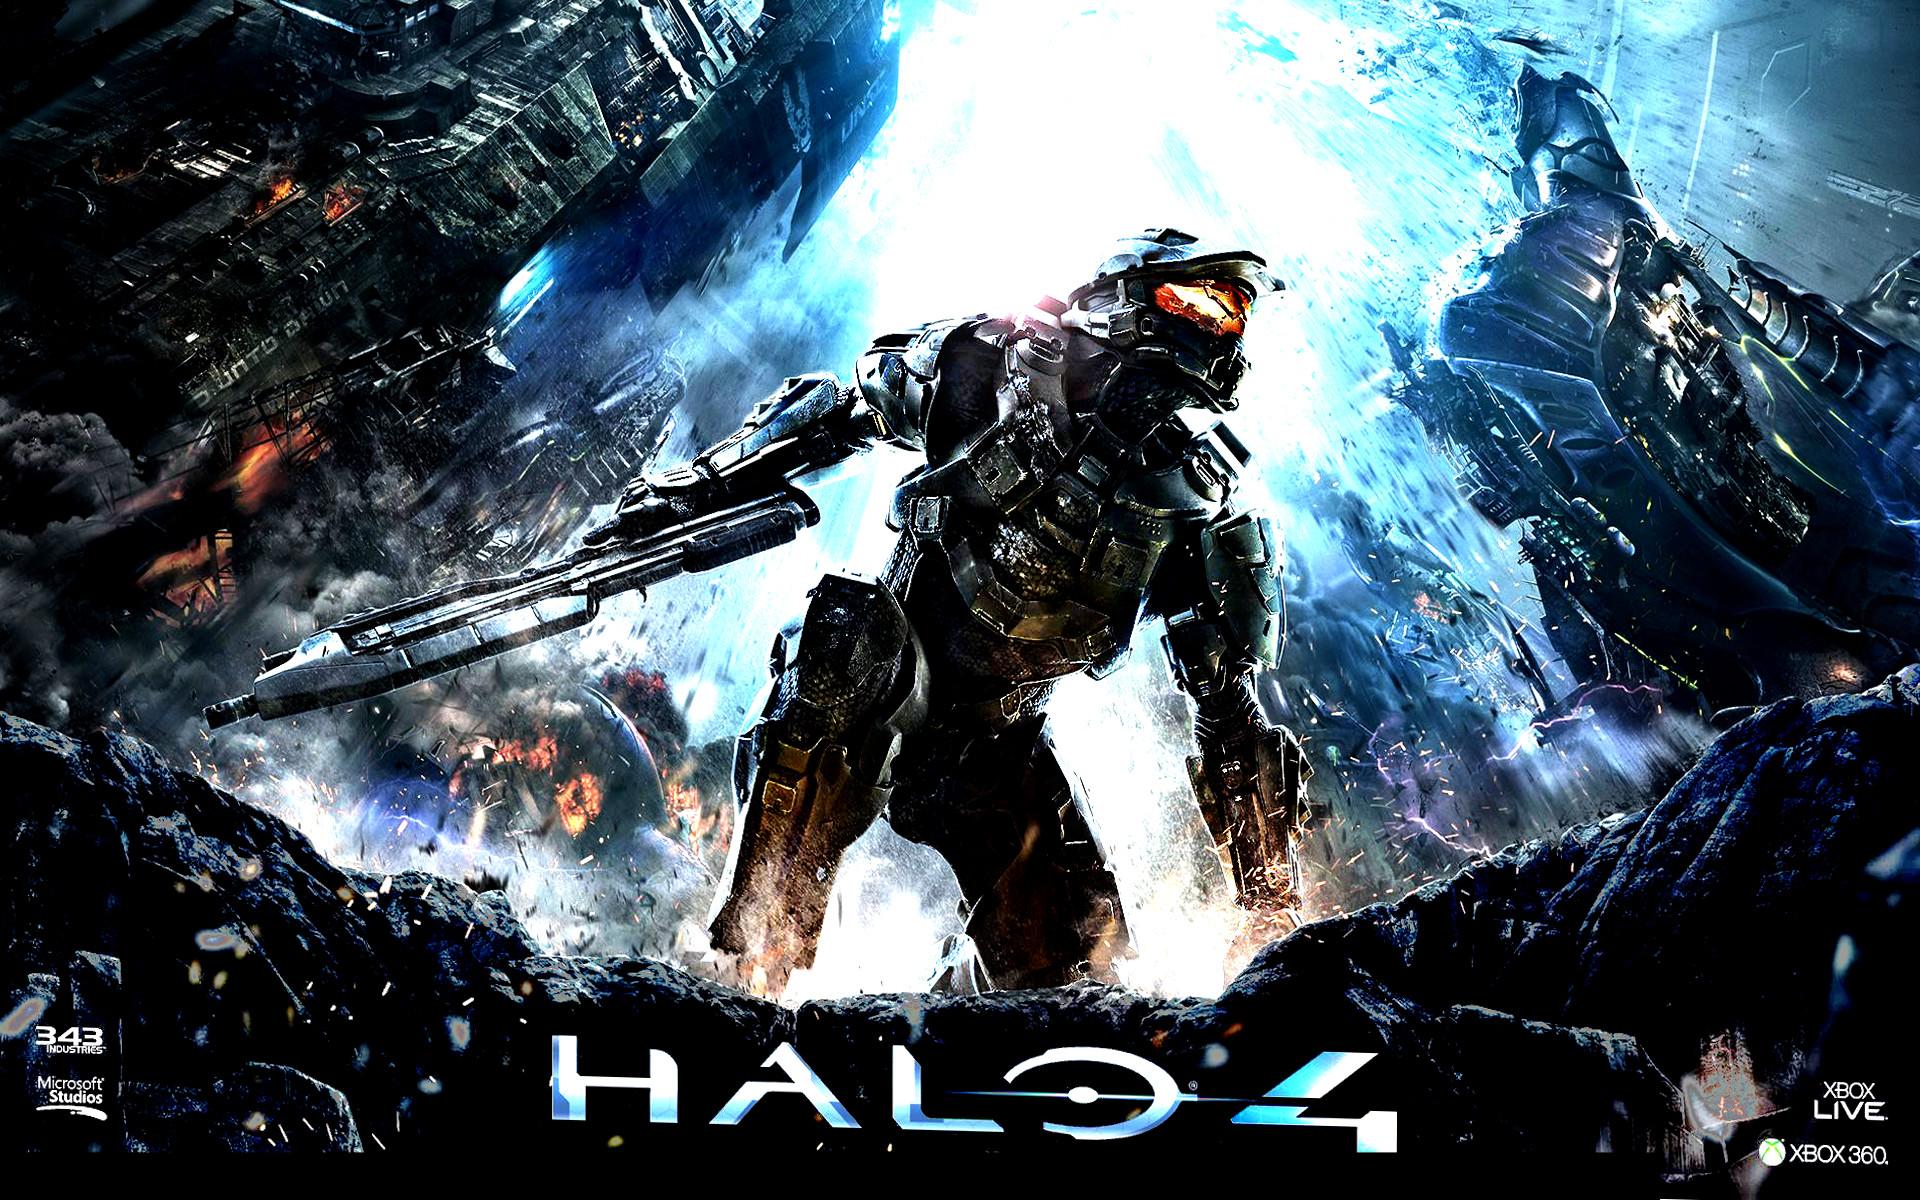 Video Game – Halo Wallpaper